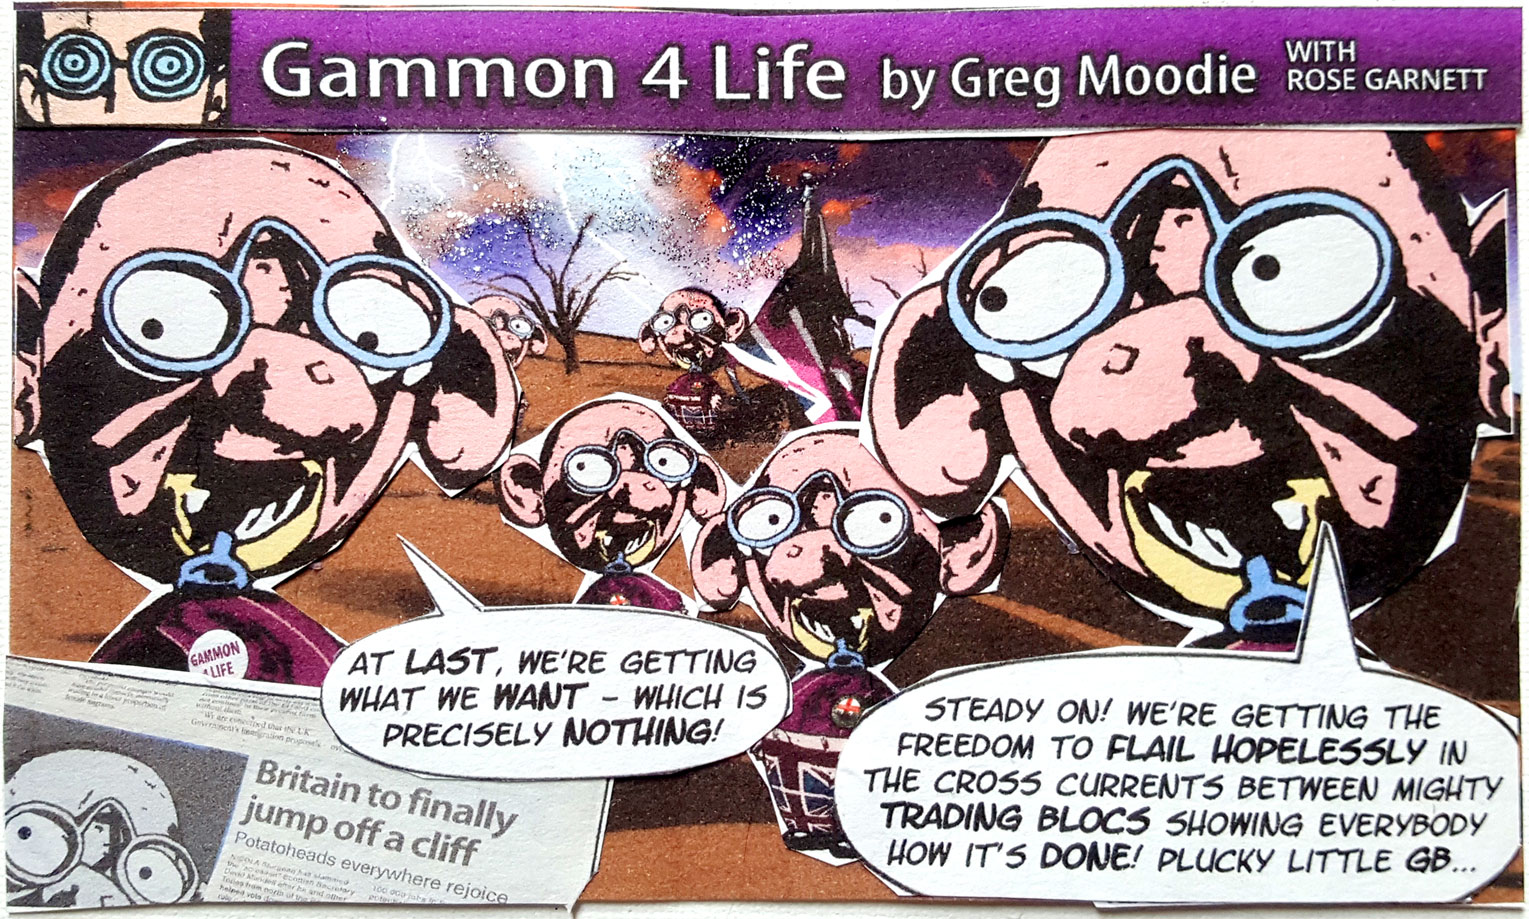 Gammon 4 Life